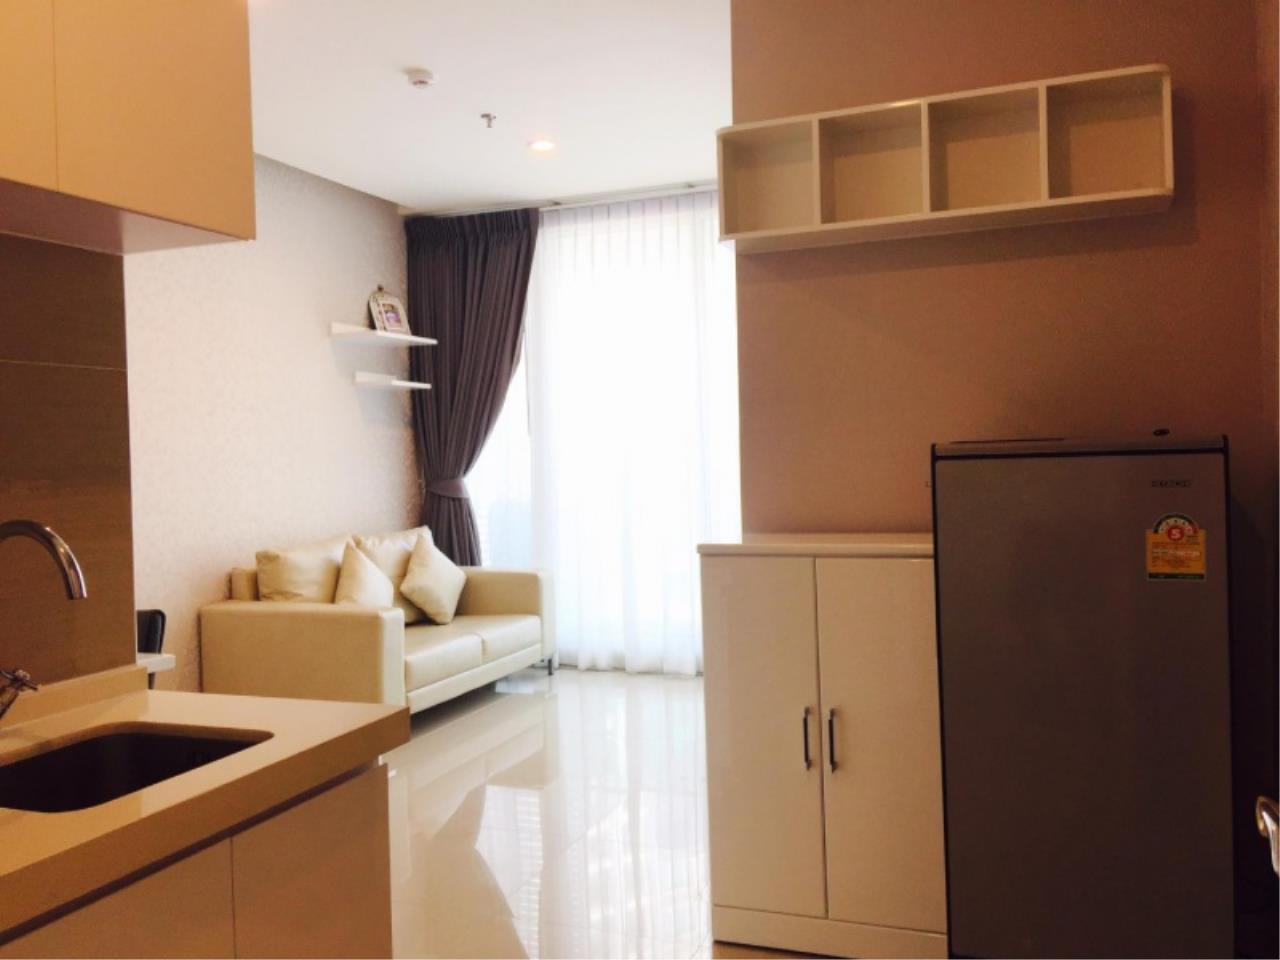 Century21 Skylux Agency's T.C. Green / Condo For Sale / 1 Bedroom / 35 SQM / MRT Phra Ram 9 / Bangkok 7